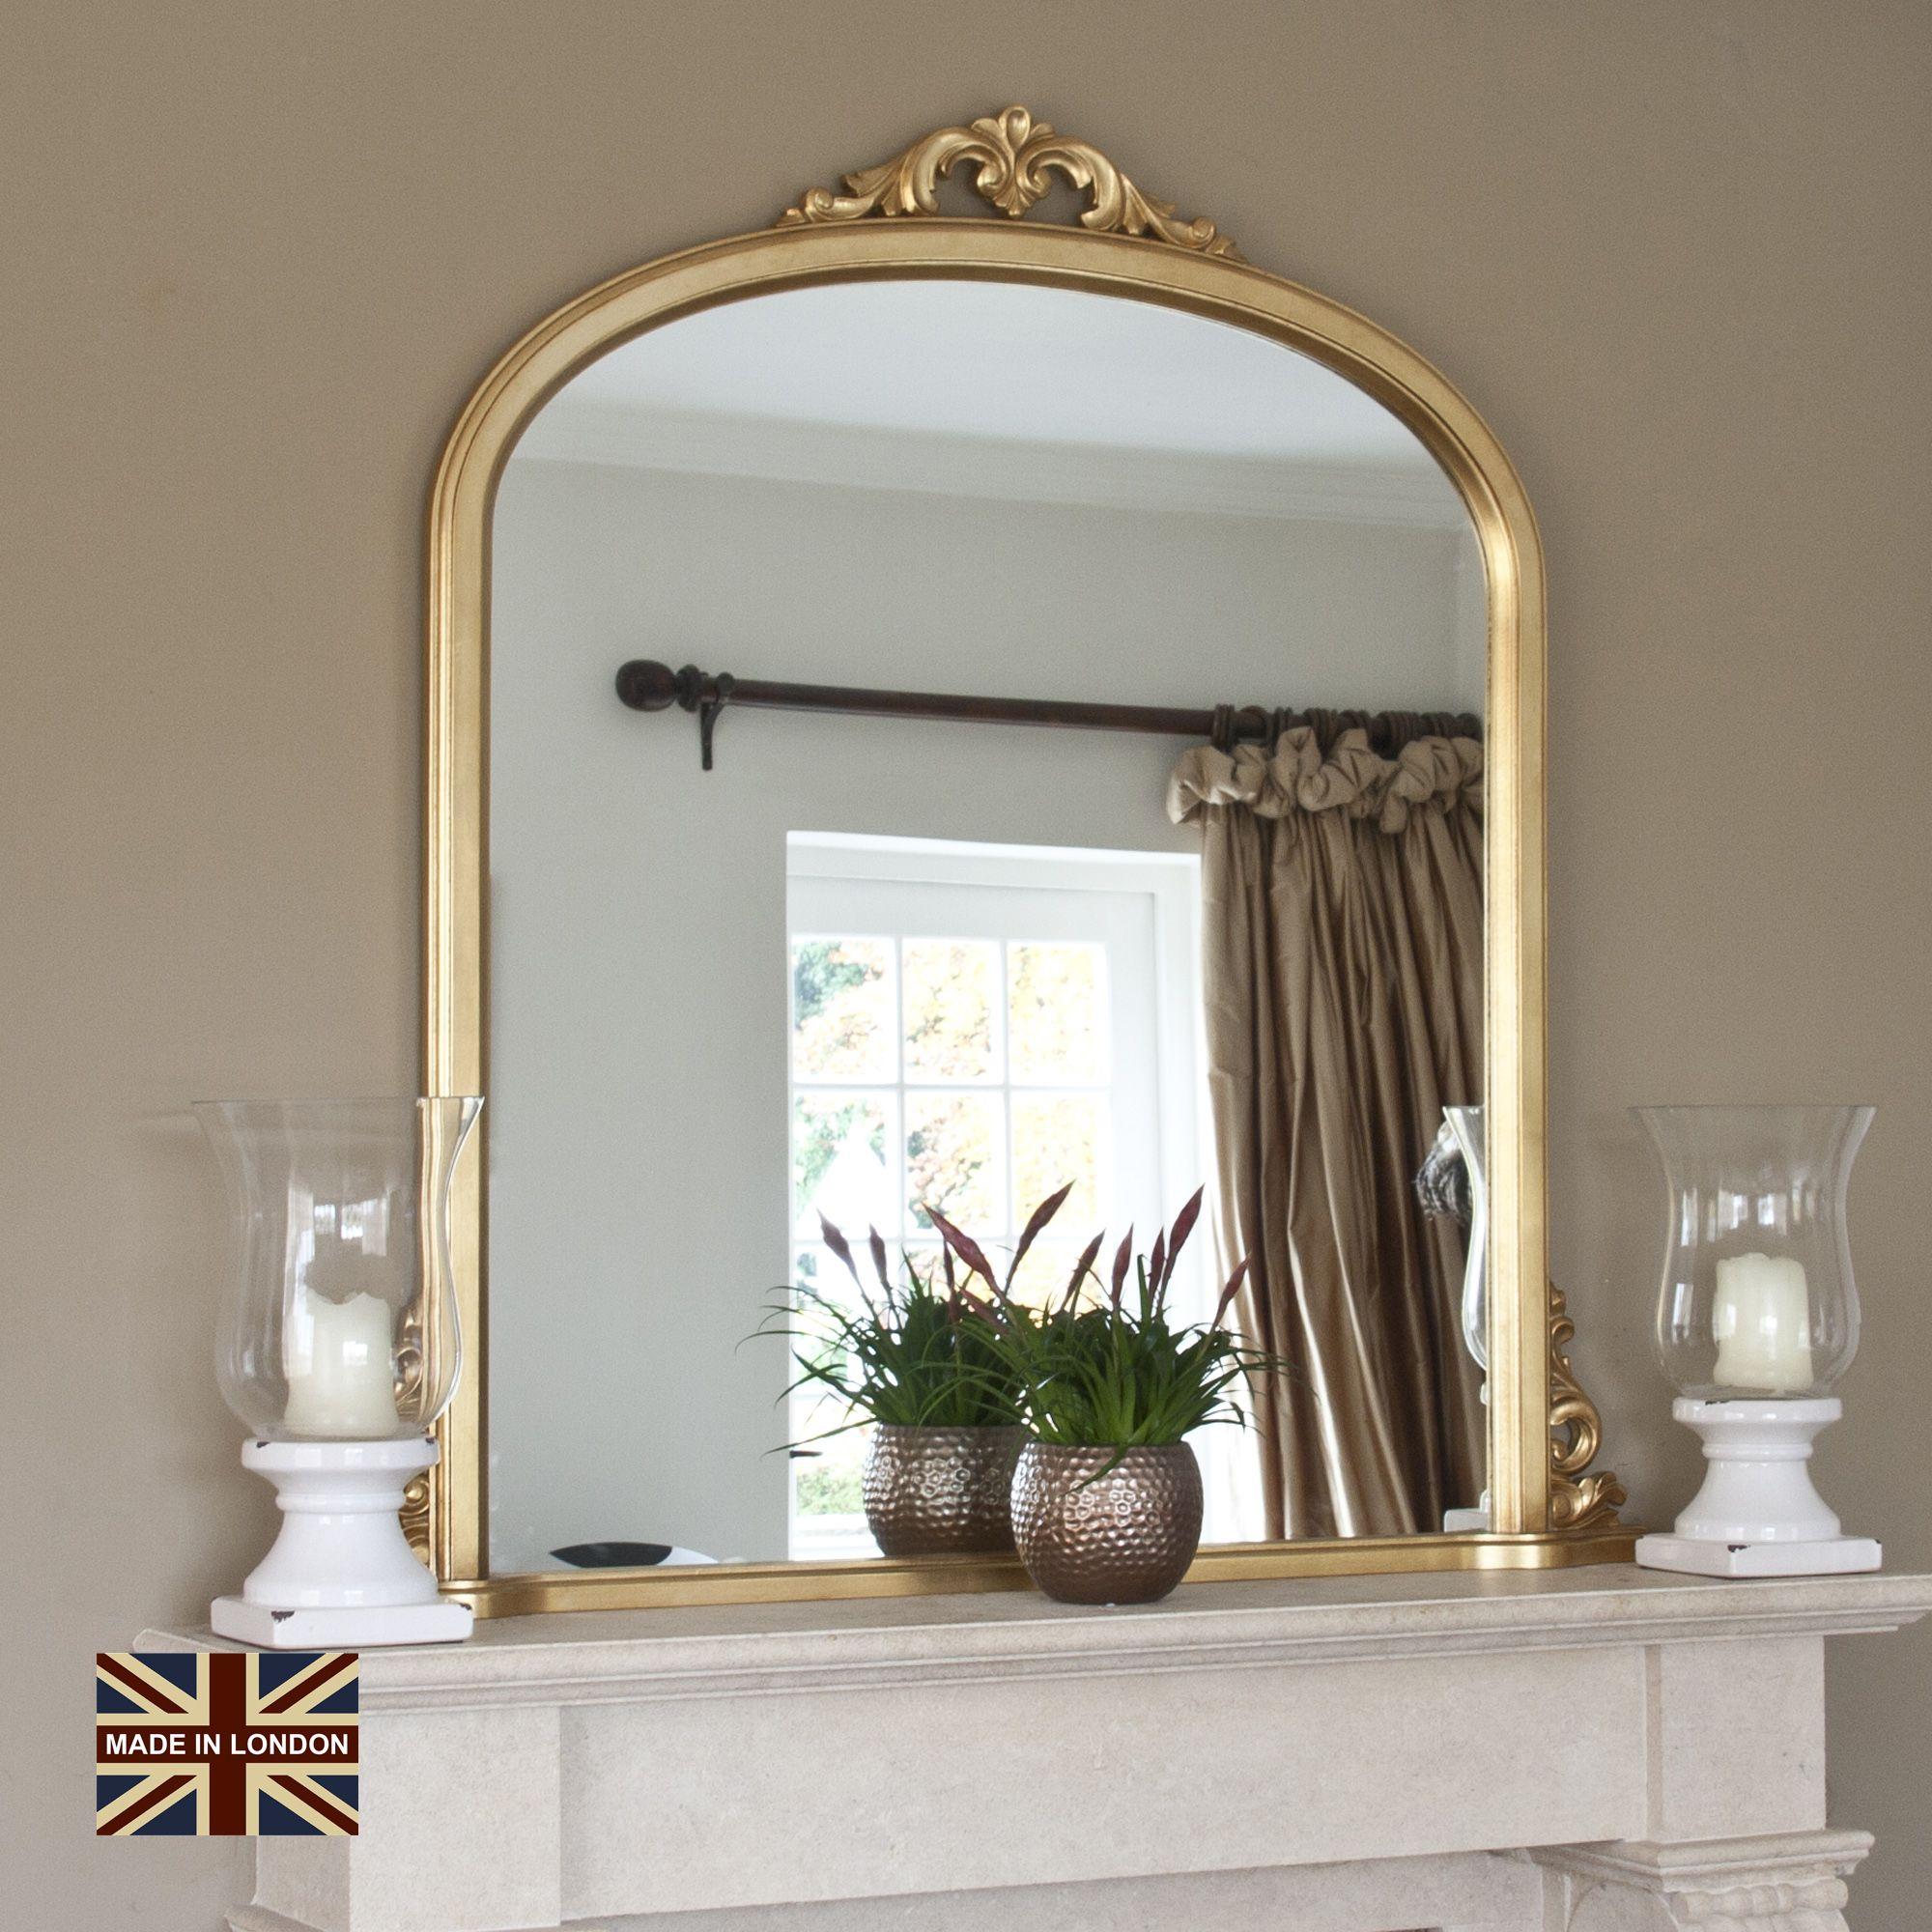 e230f59967d8c Large Plain Gold Overmantel Mirror